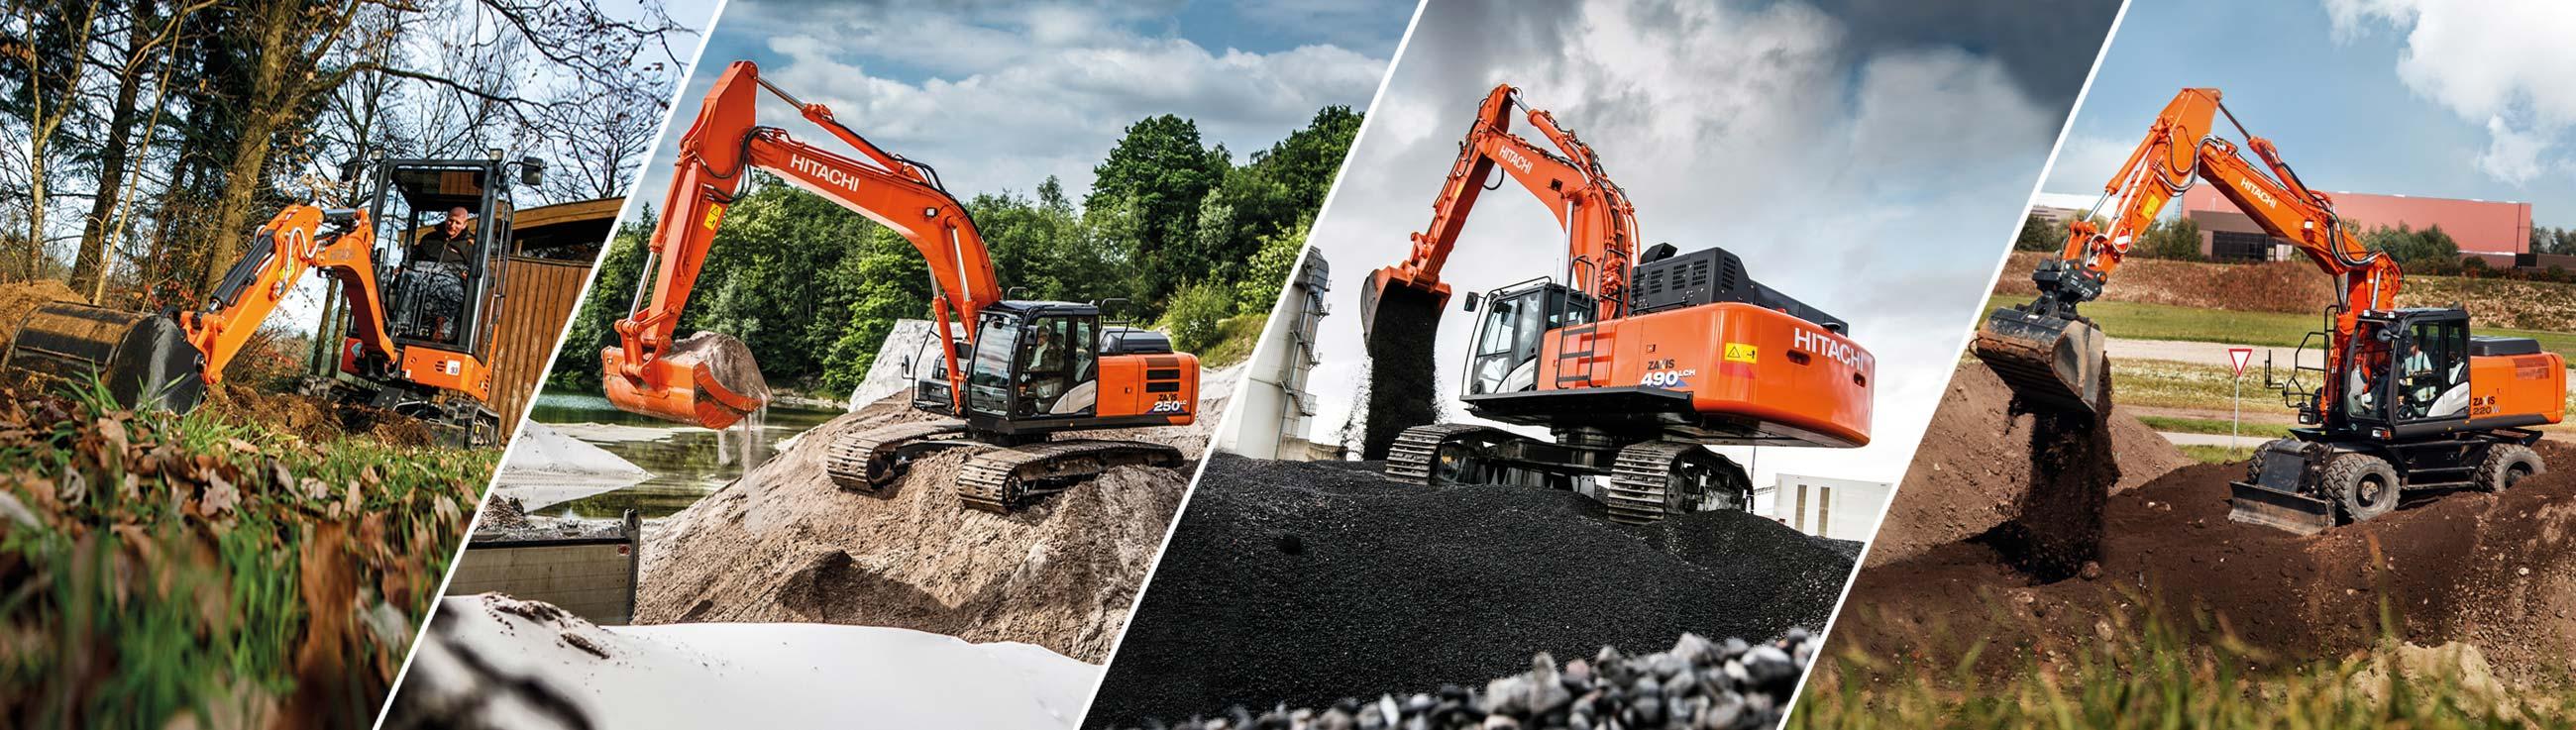 excavators hitachi construction machinery